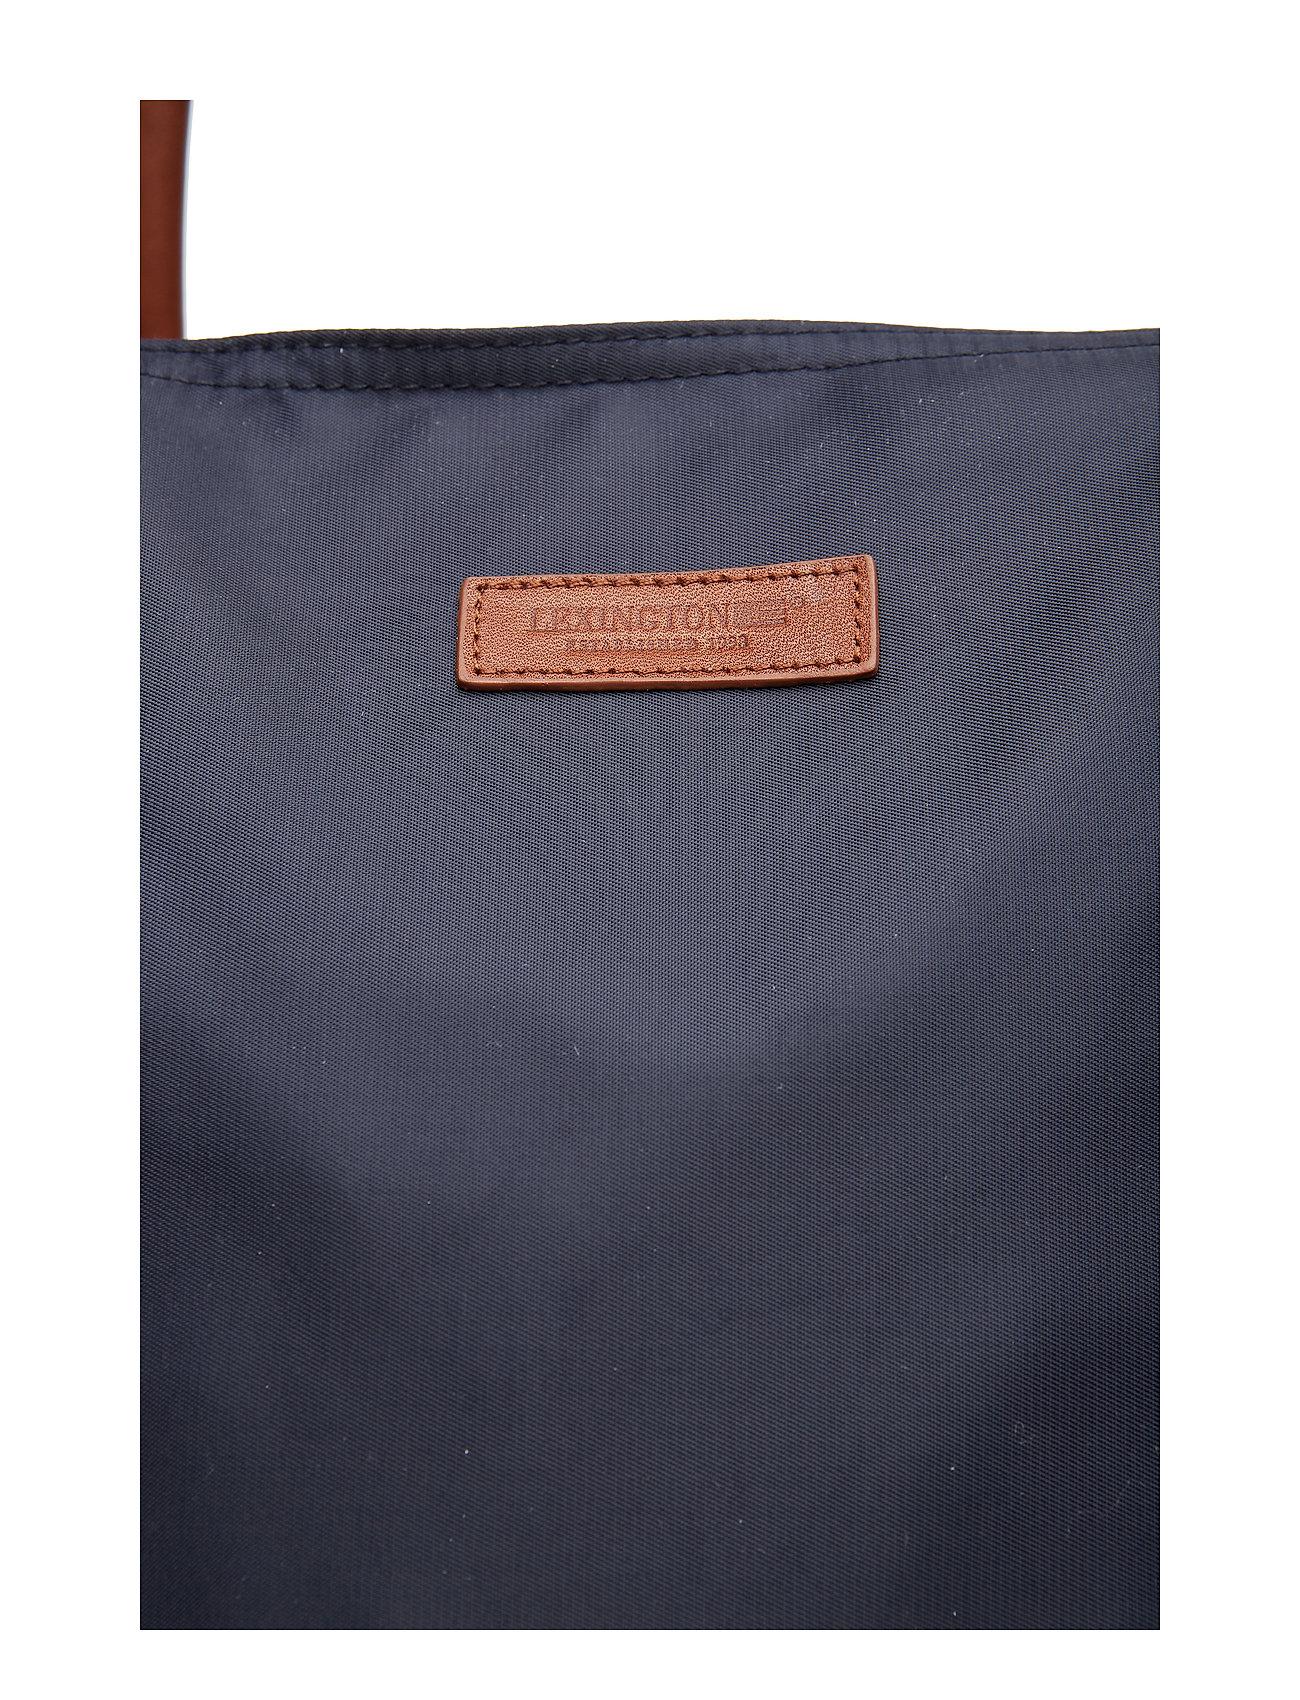 Mayflower Tote BlueLexington Nylon Bagnavy Clothing nO08PZwNkX